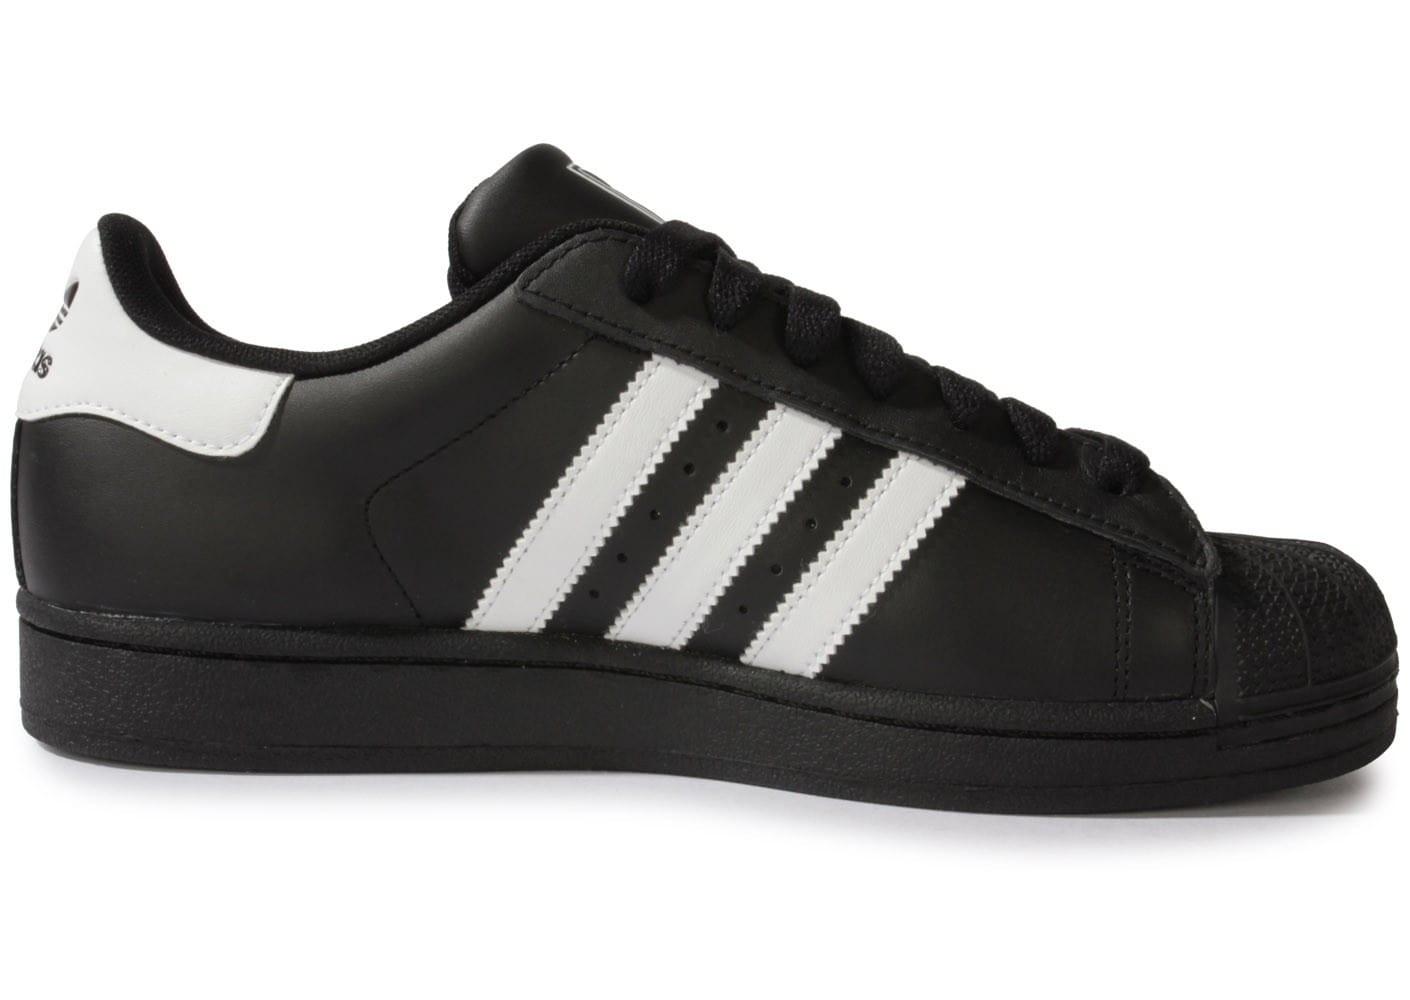 adidas superstar homme noir et blanc